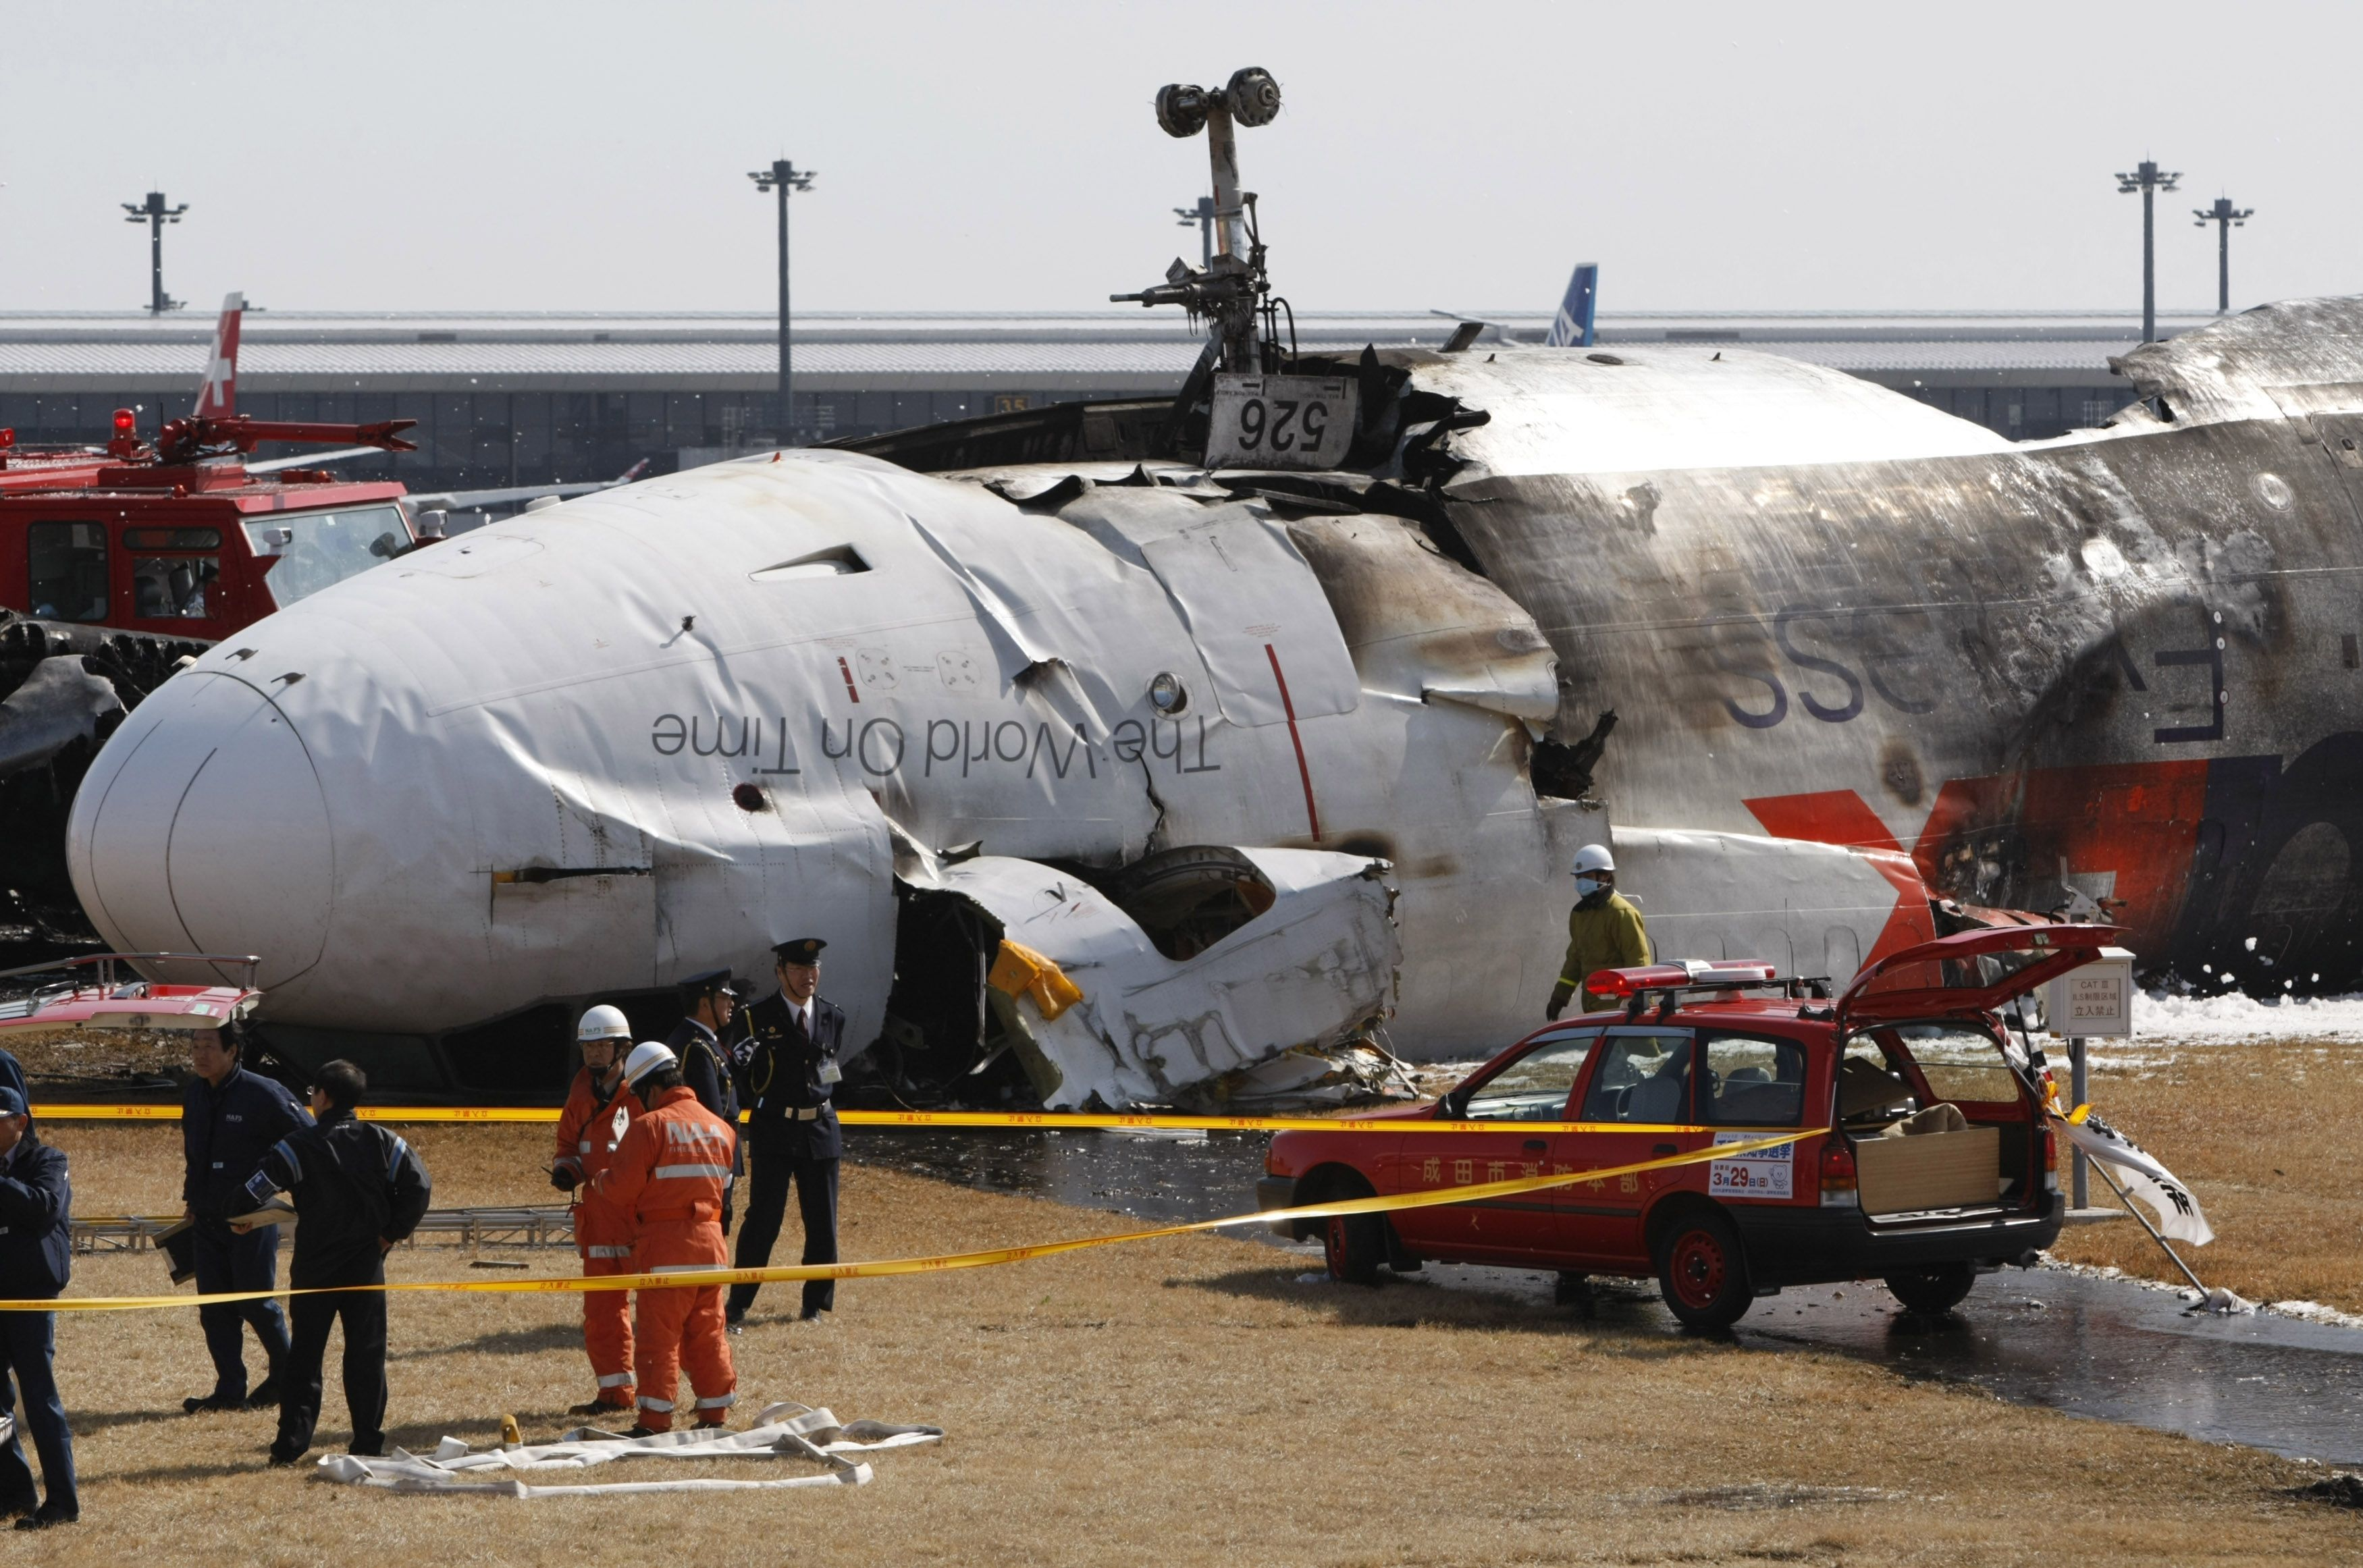 Fedex Plane Crash Japan Today